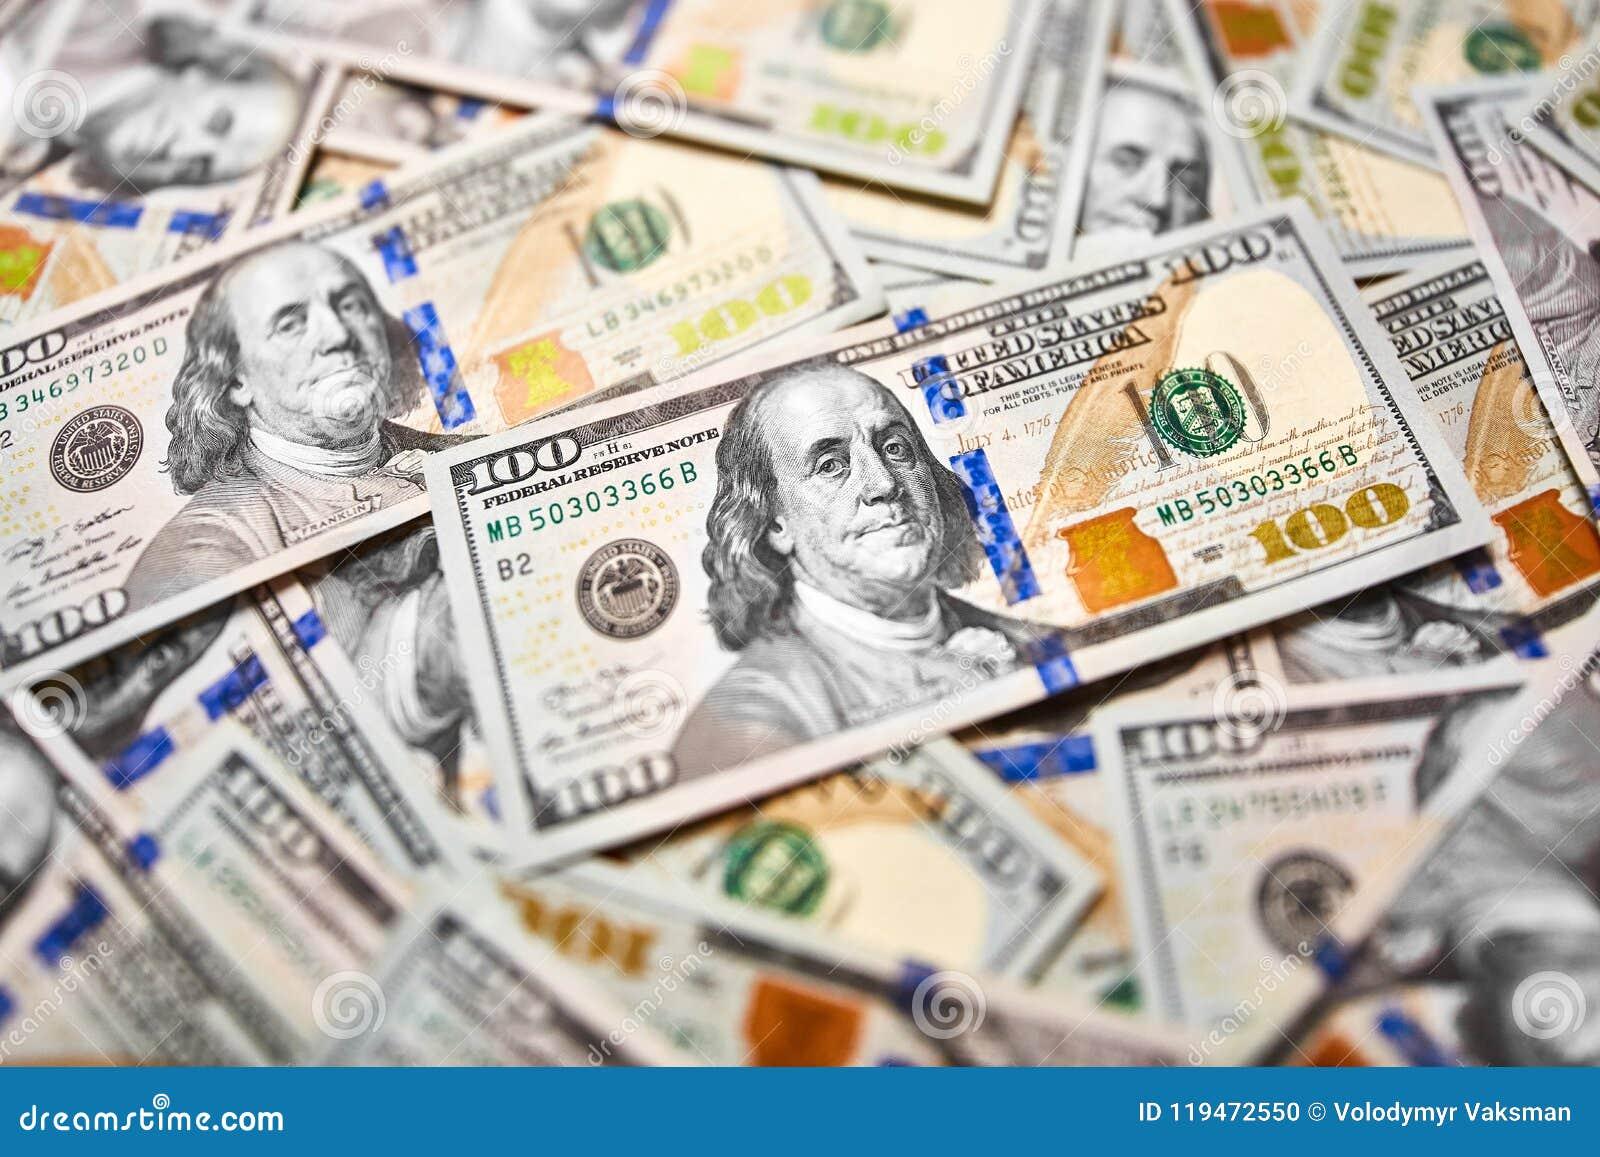 Background Of 100 Dollar Bills Money American Hundred